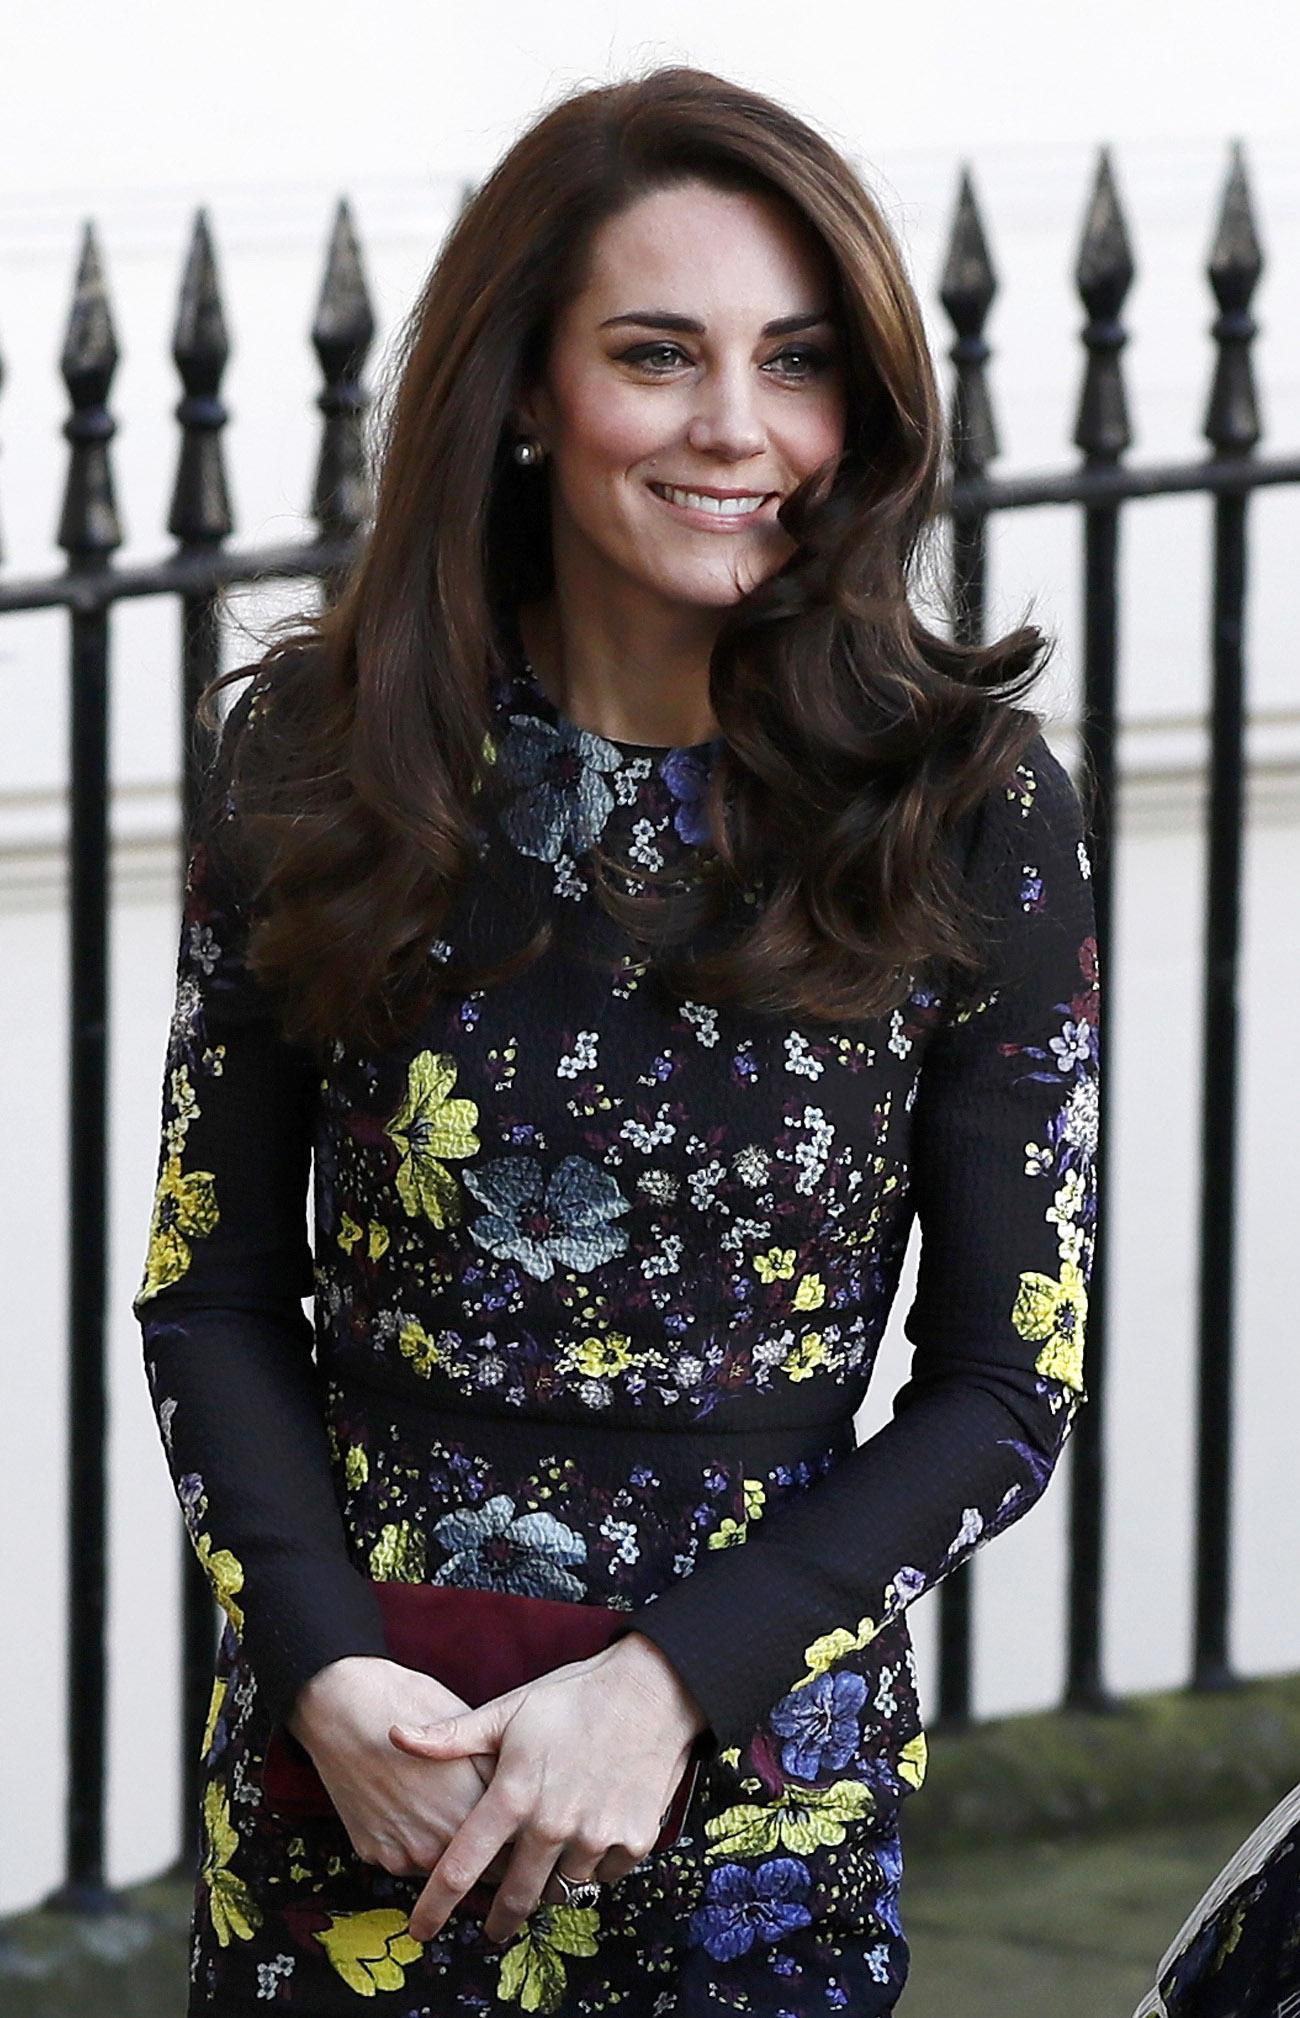 A running joke! Kate Middleton's hilarious response to Prince William's plans to run the marathon